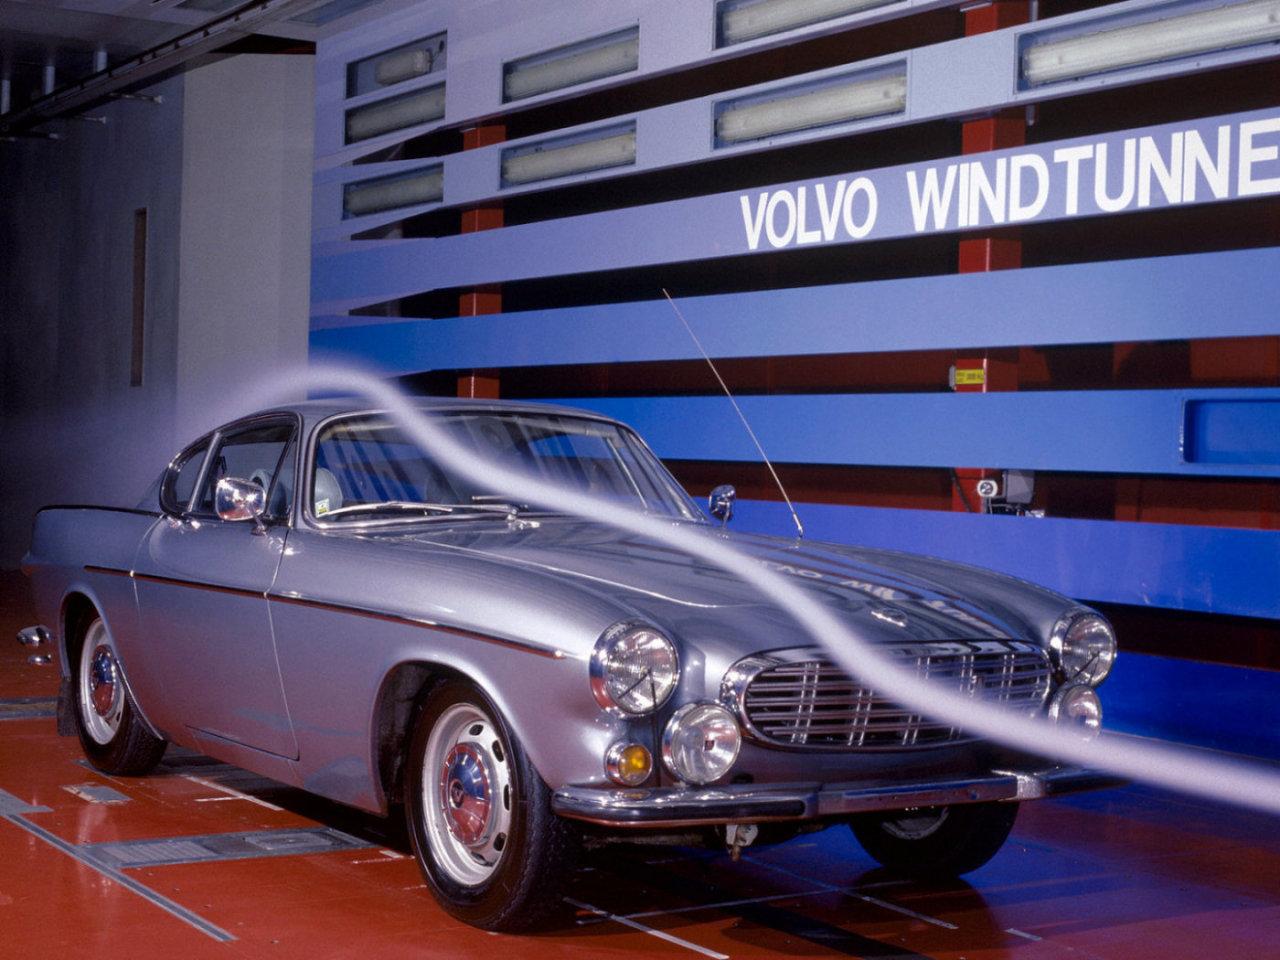 1961 volvo p1800 classic automobiles. Black Bedroom Furniture Sets. Home Design Ideas